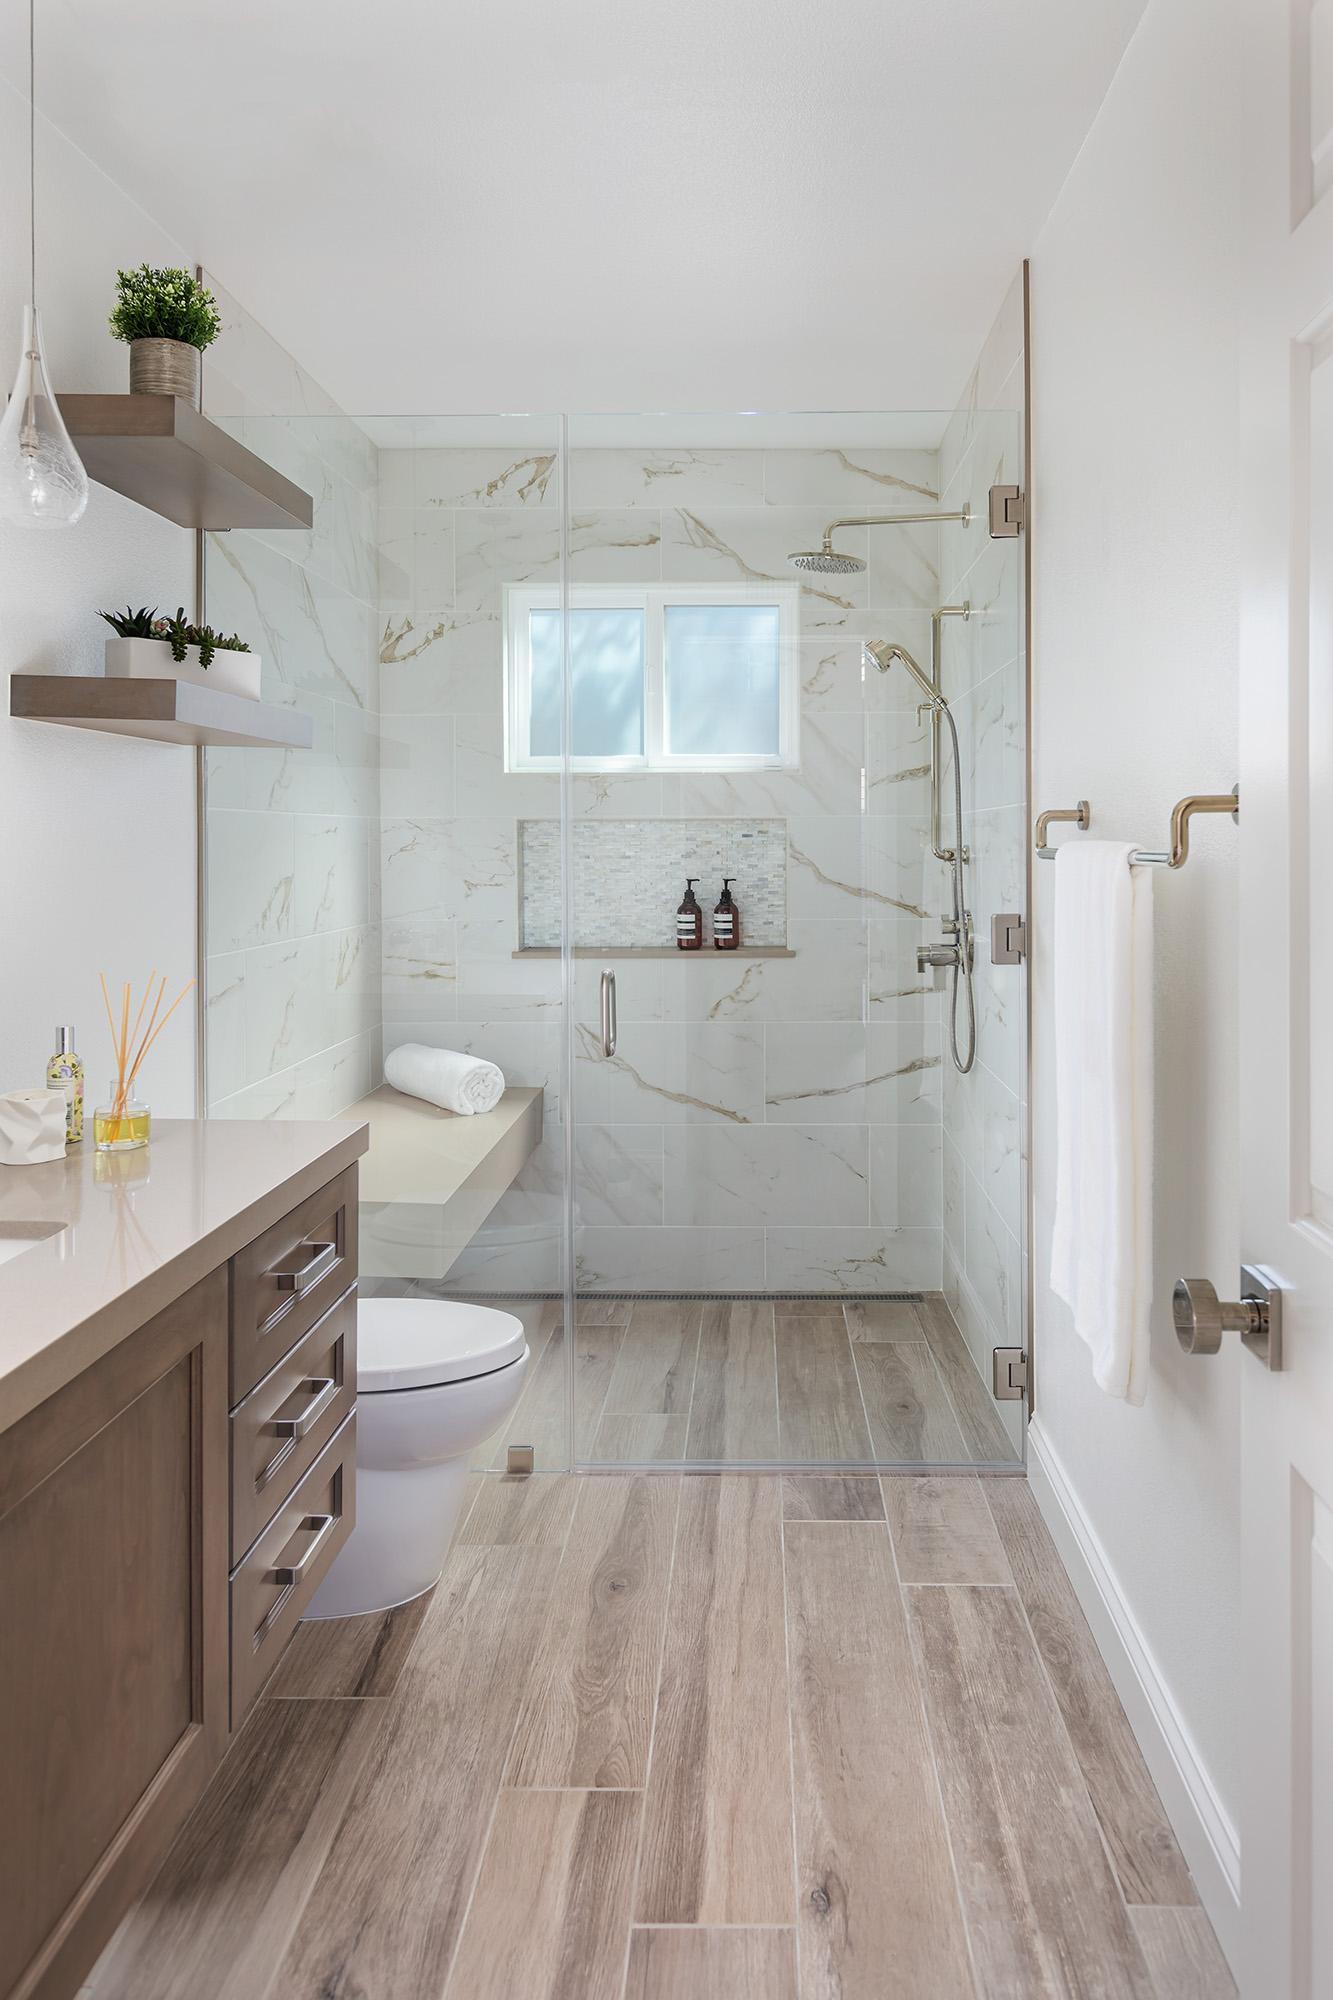 Bathroom with white tub, glass shower, black and white tiled floor